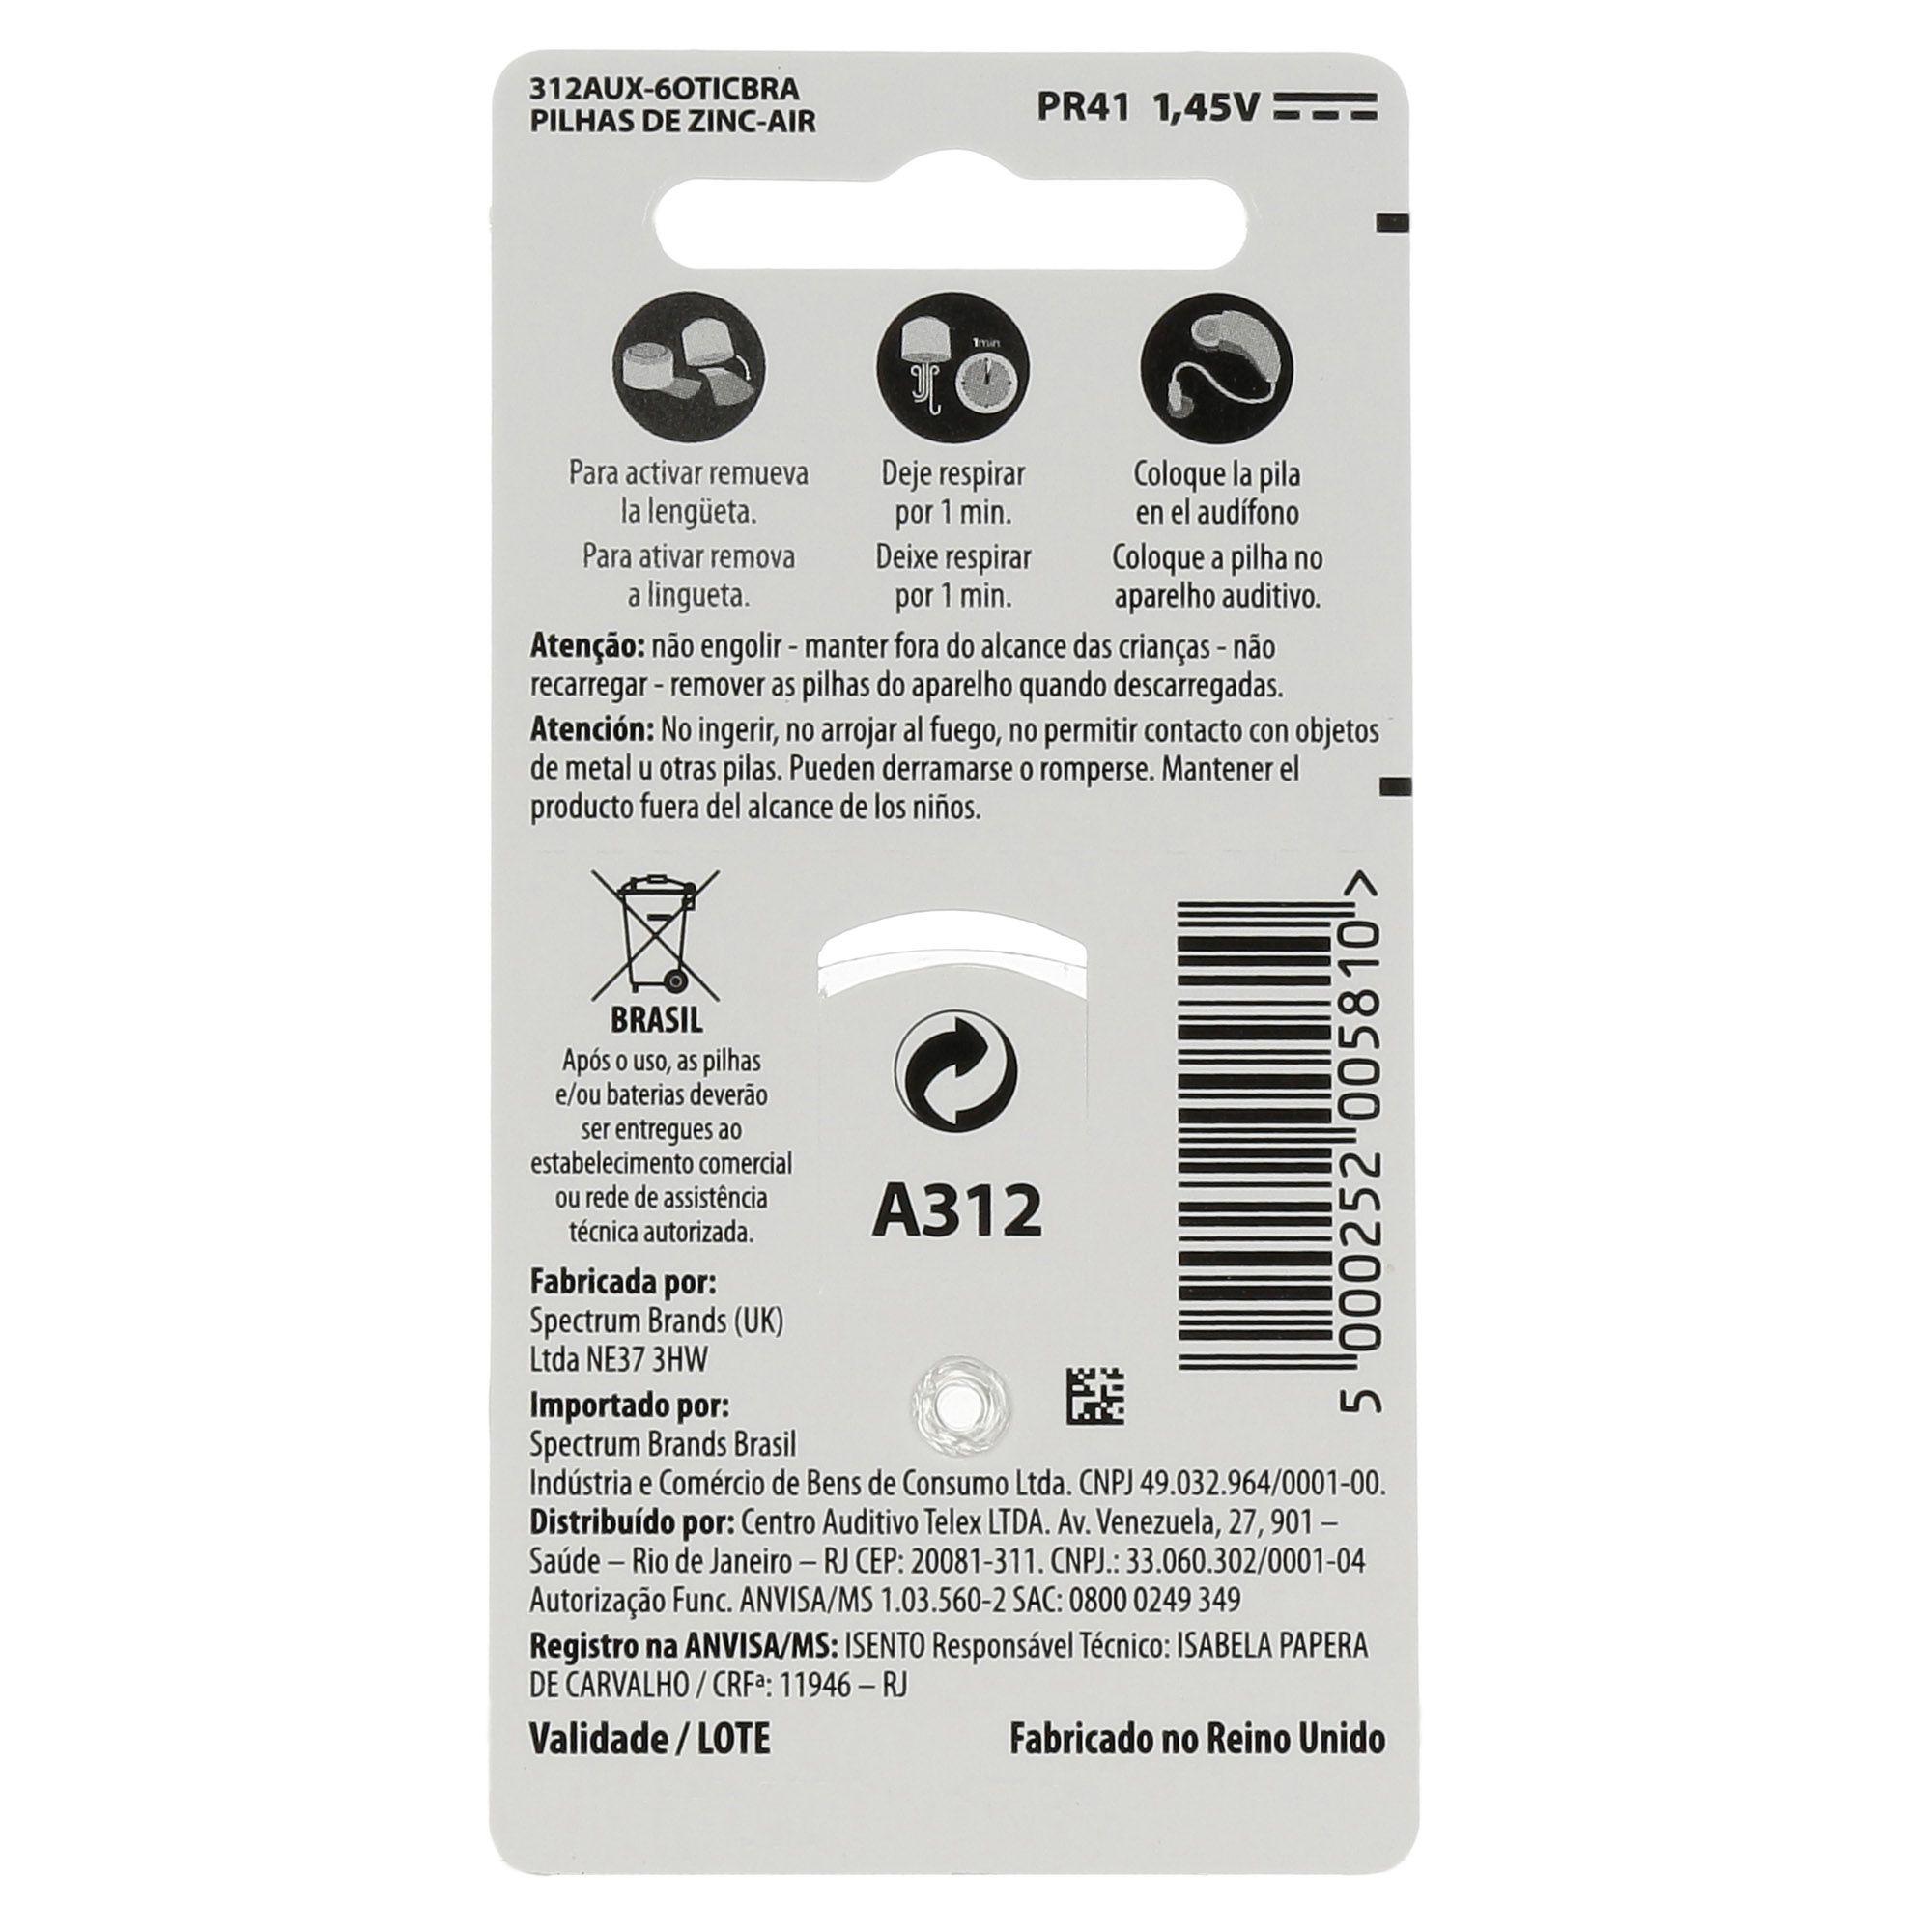 OTICON 312 / PR41 - 1 Cartela - 6 Baterias para Aparelho Auditivo  - SONORA